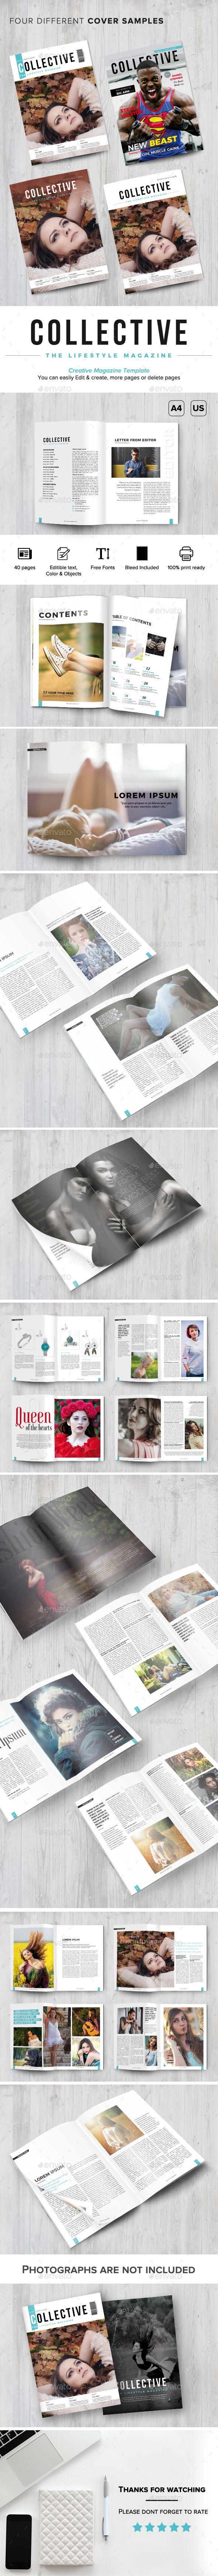 Collective Magazine - Magazines Print Templates